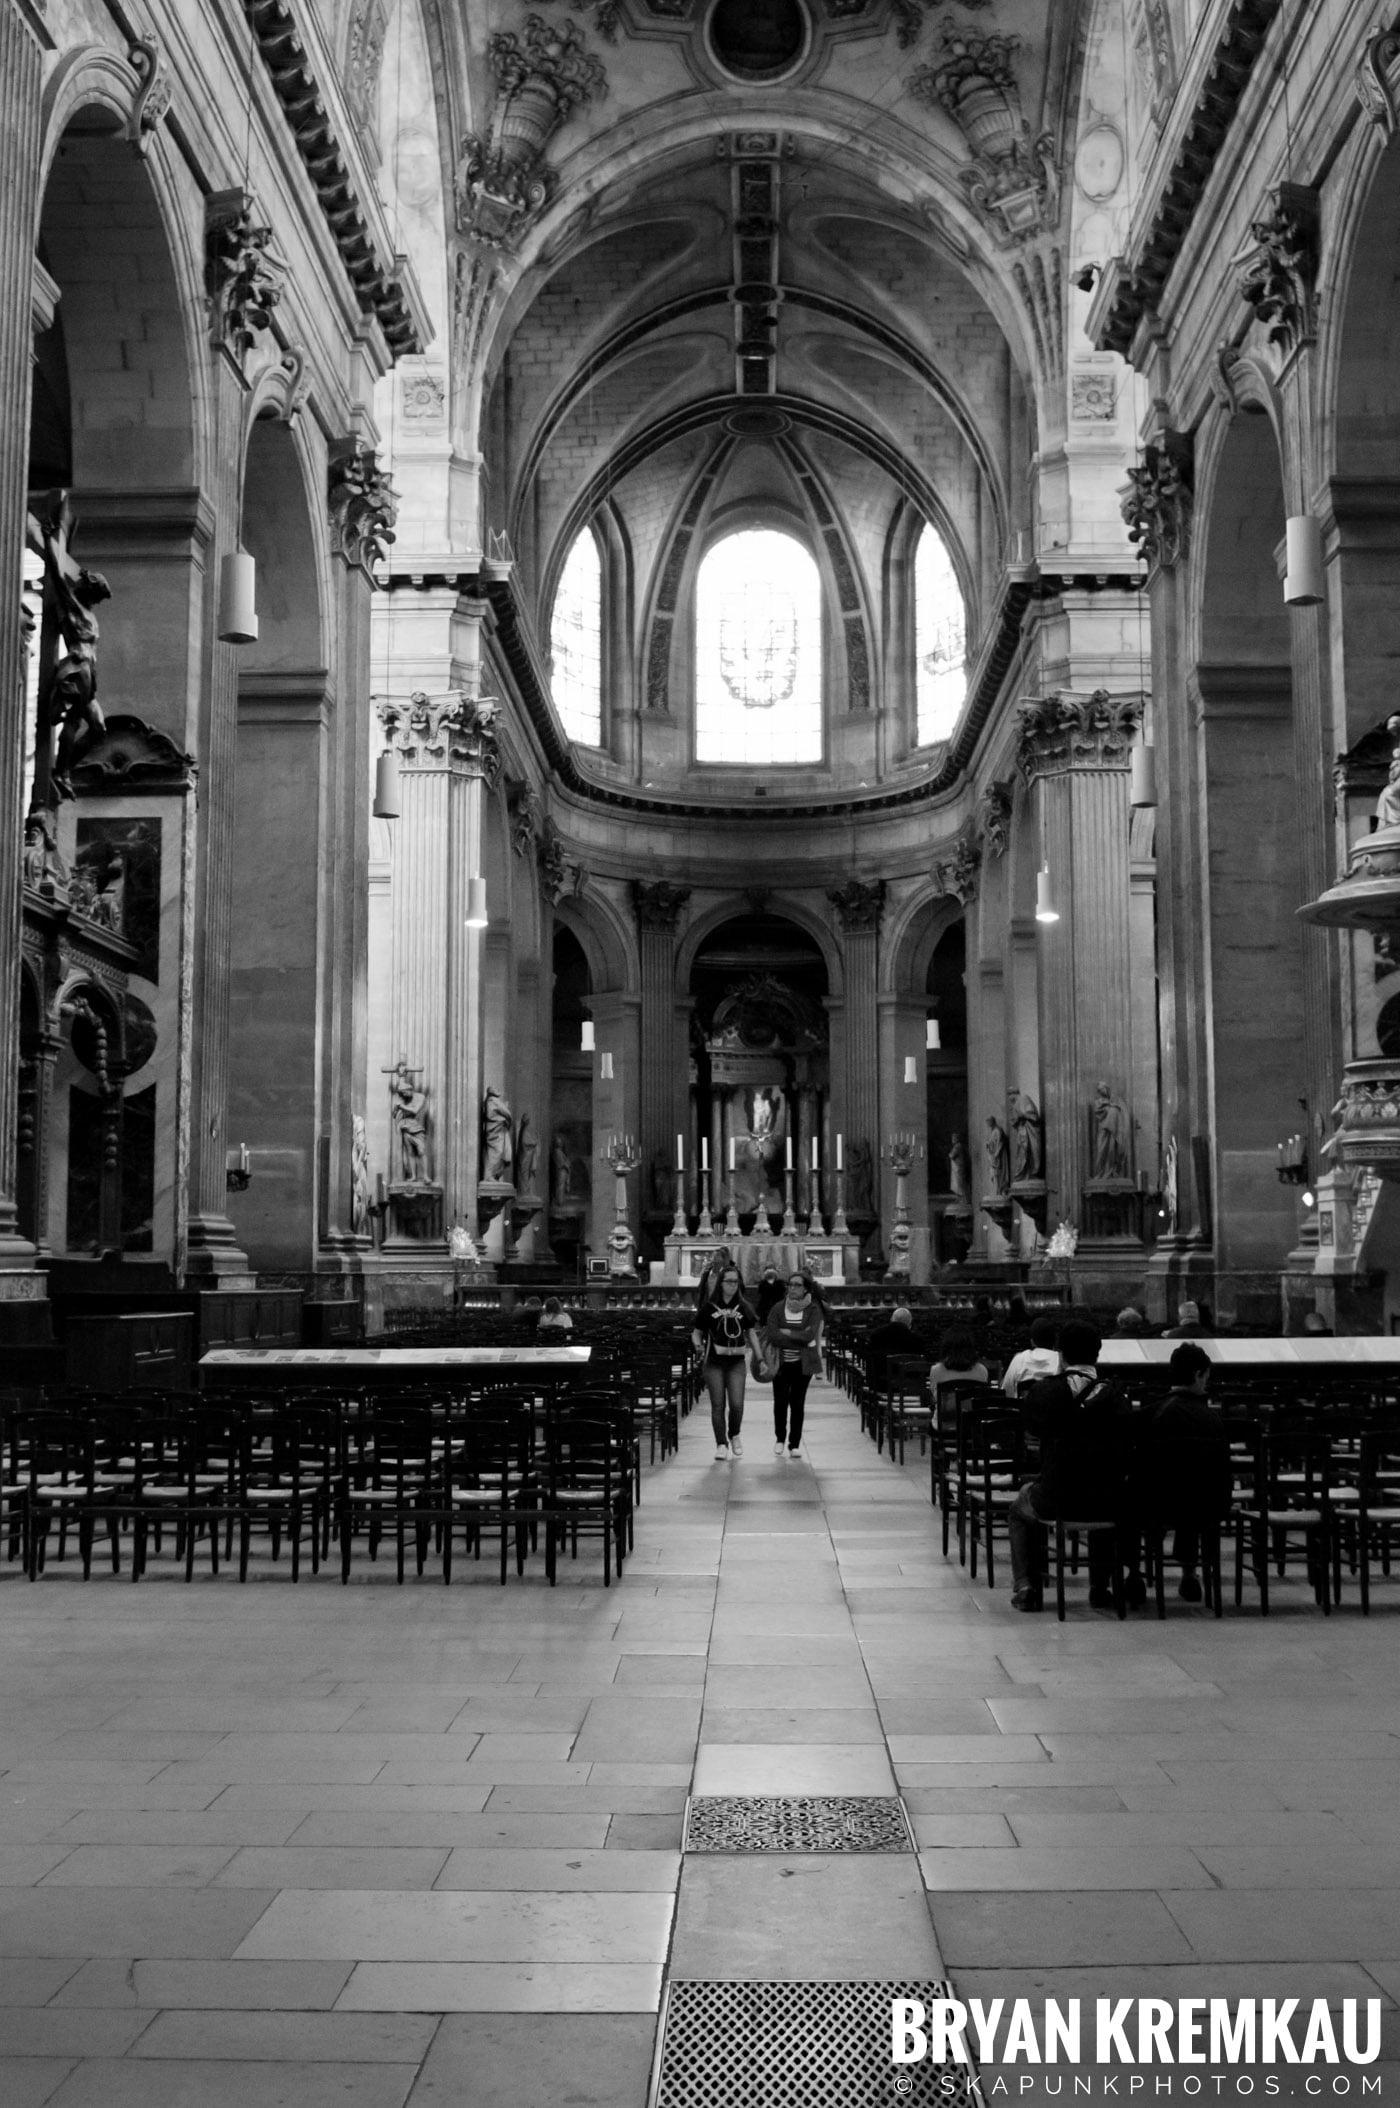 Paris, France Honeymoon - Day 1 - 7.18.11 (17)